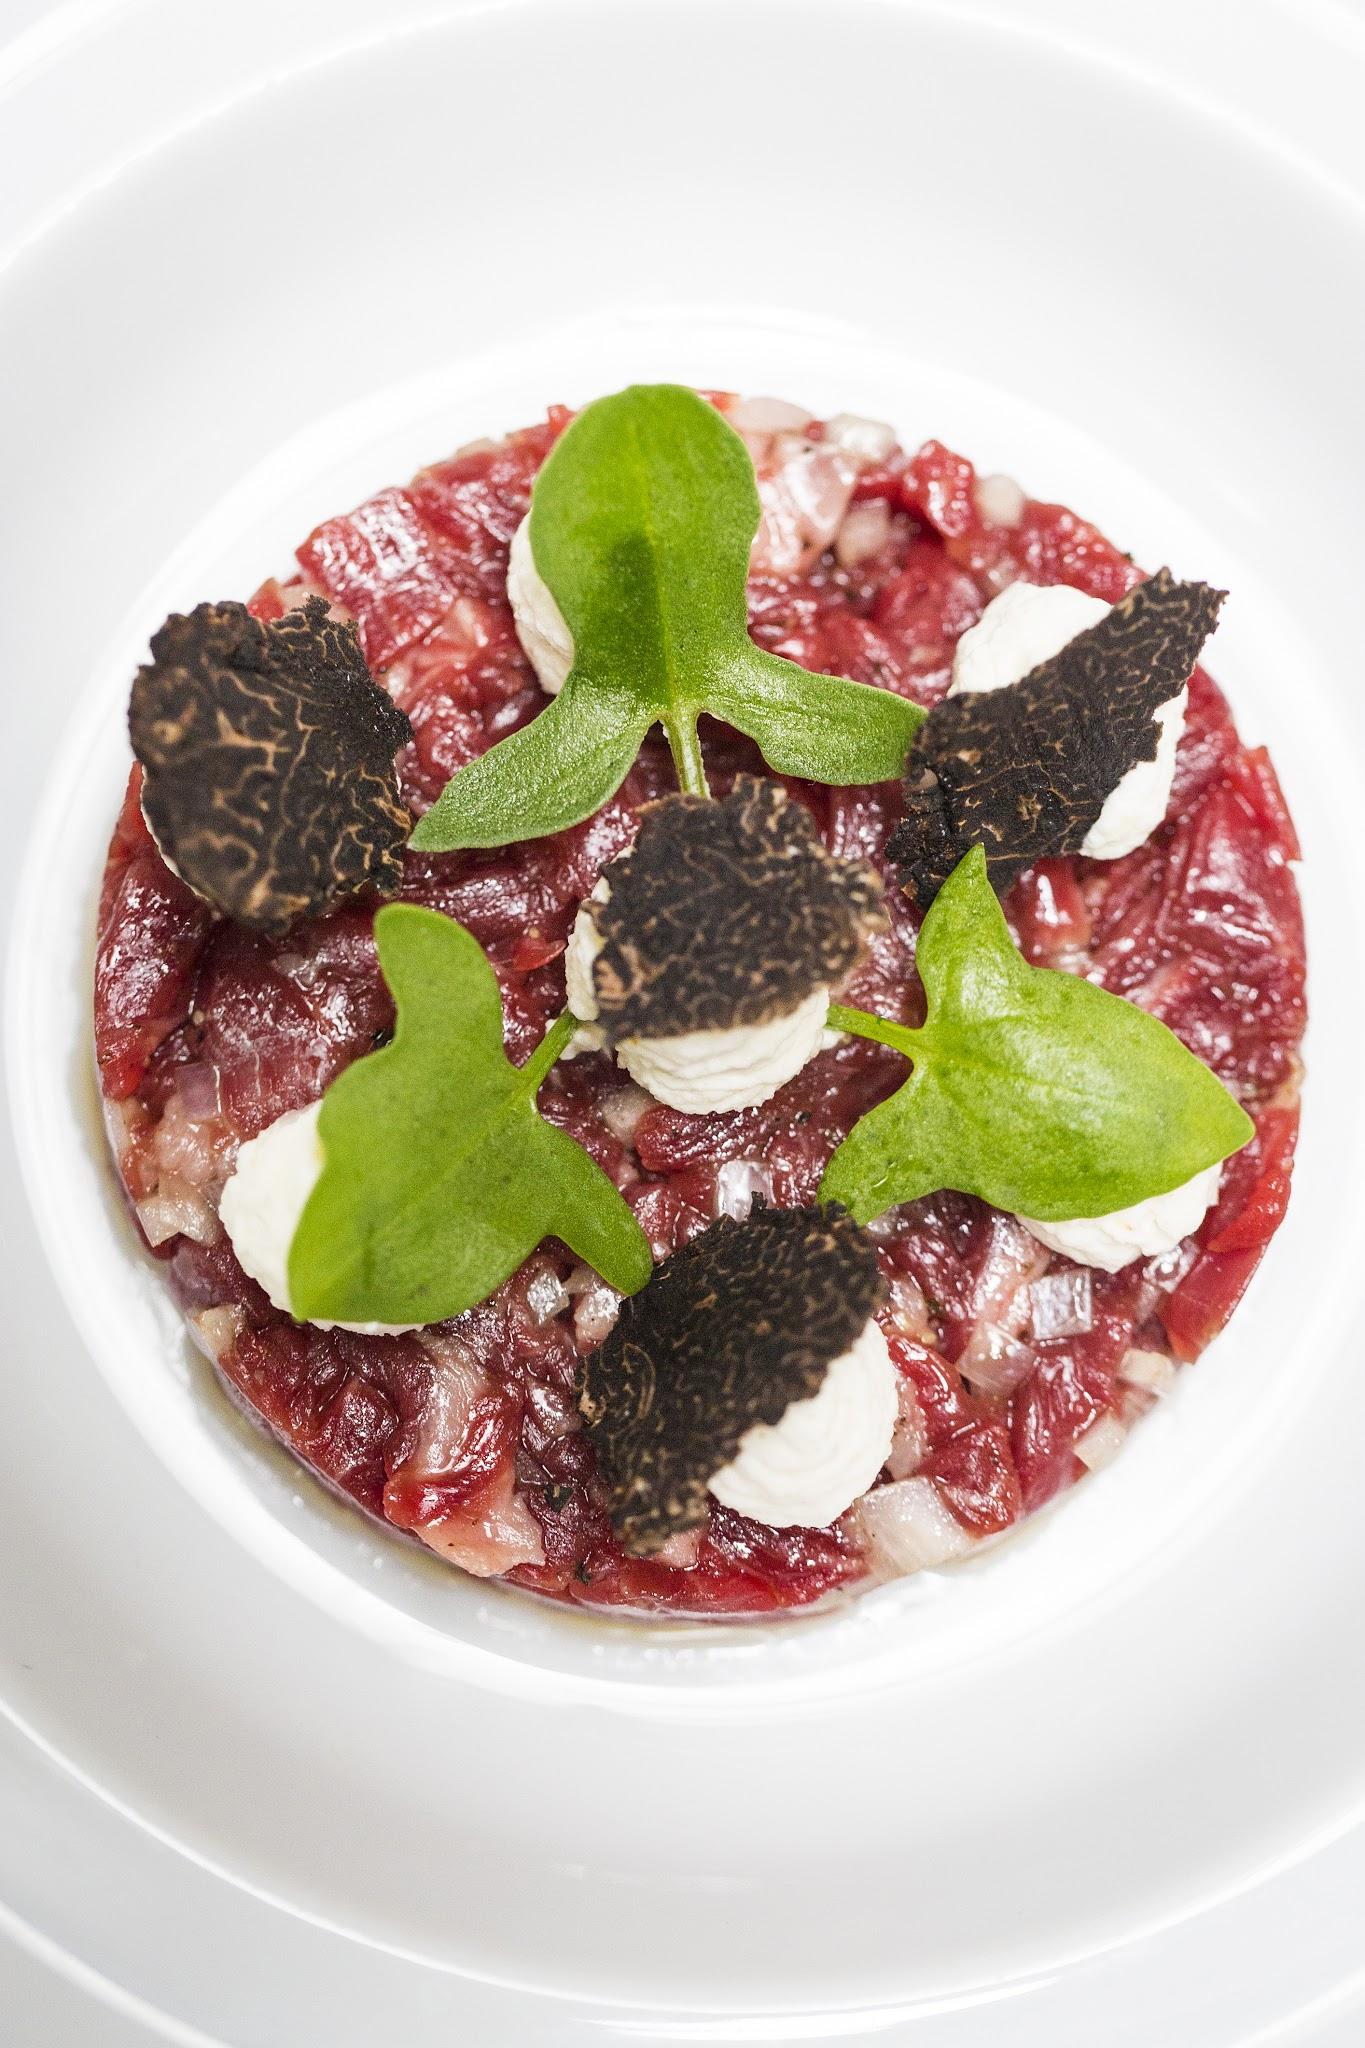 Arcane, Australian Day Menu, Beef Tartare